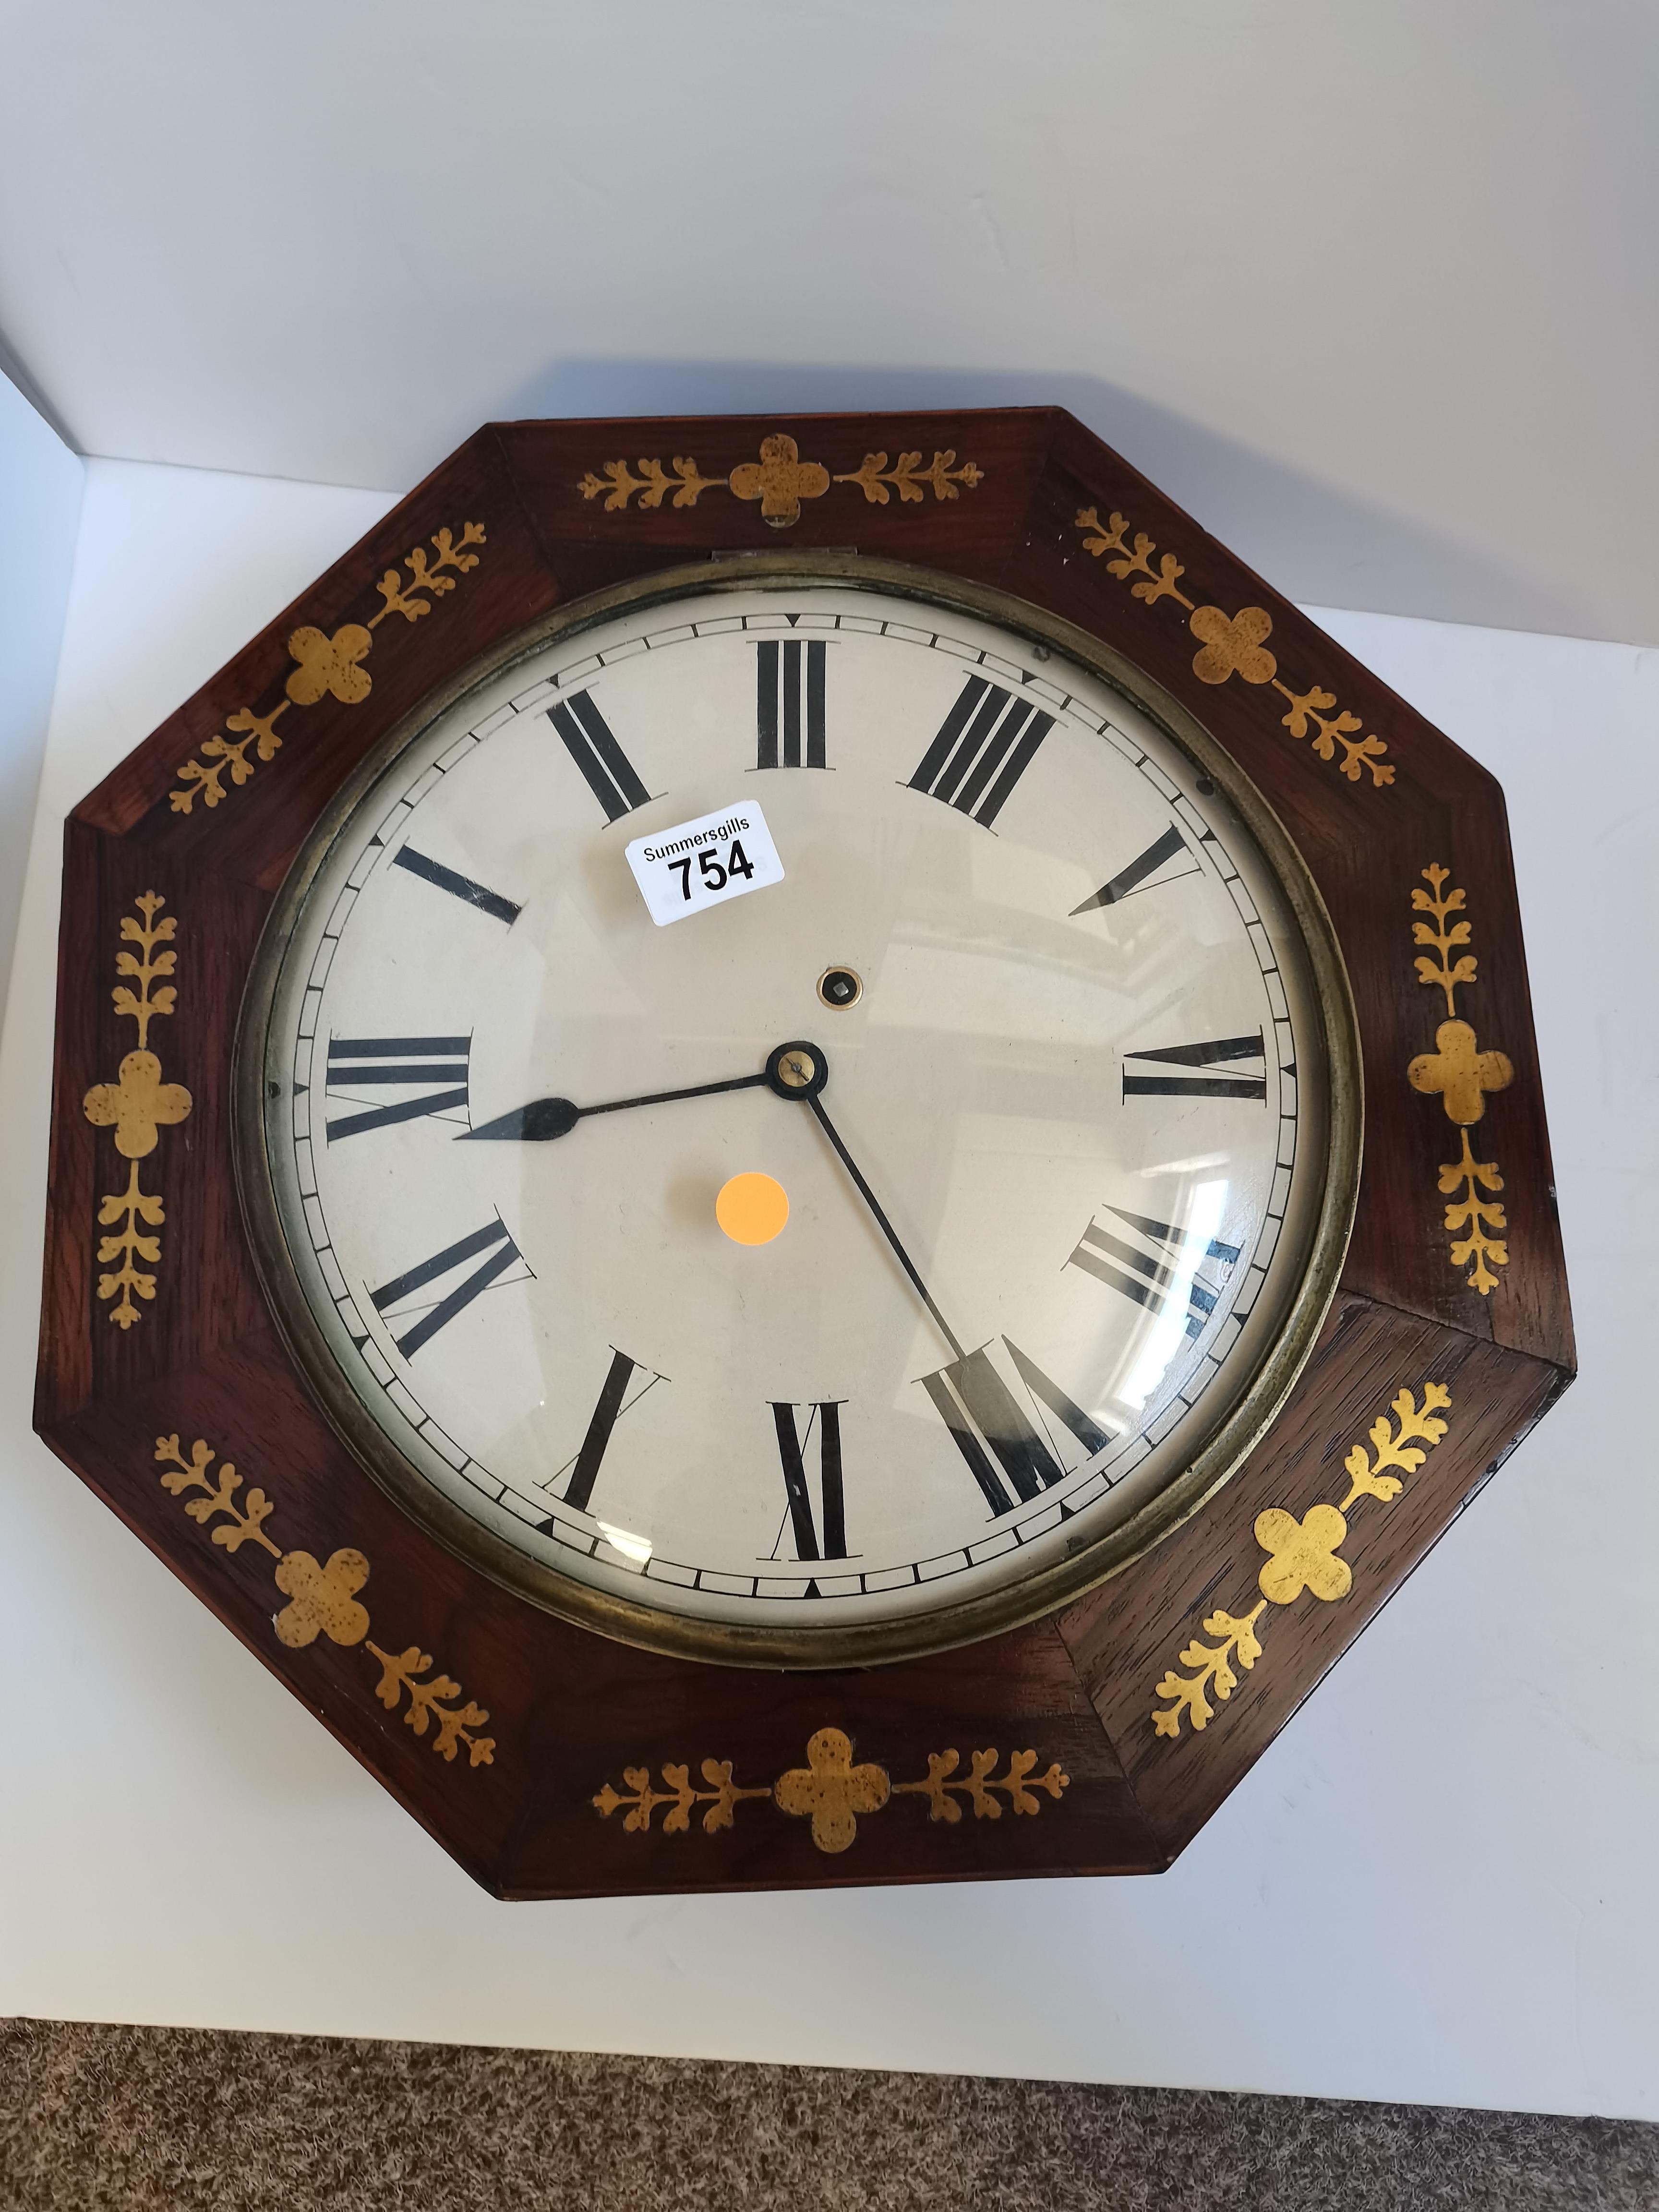 Regency Wall Clock - Image 3 of 6